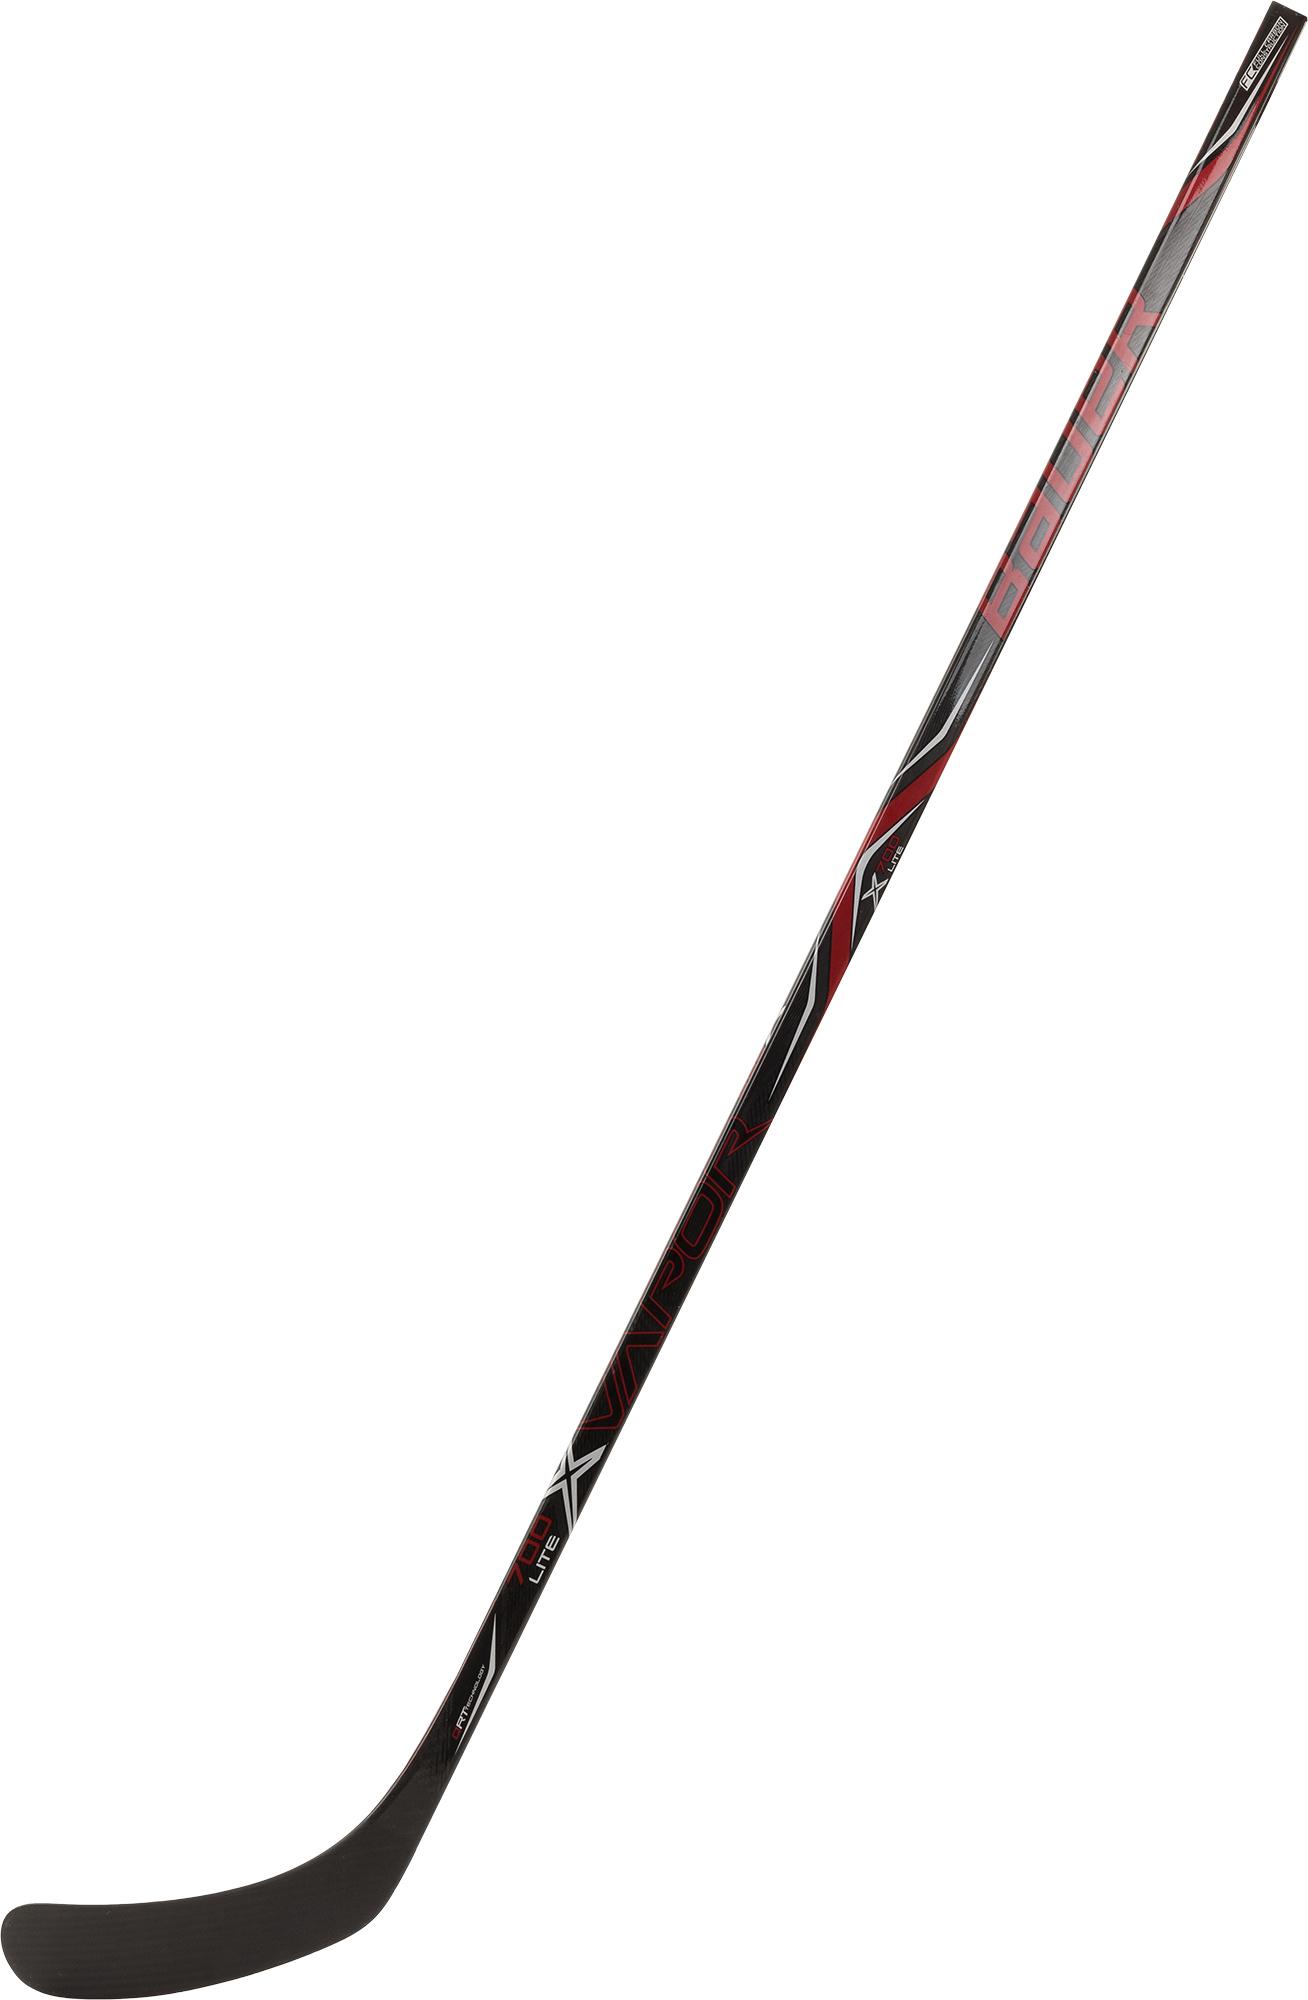 Bauer Клюшка хоккейная Bauer BAUER S18 VAPOR X 700 LITE, размер L